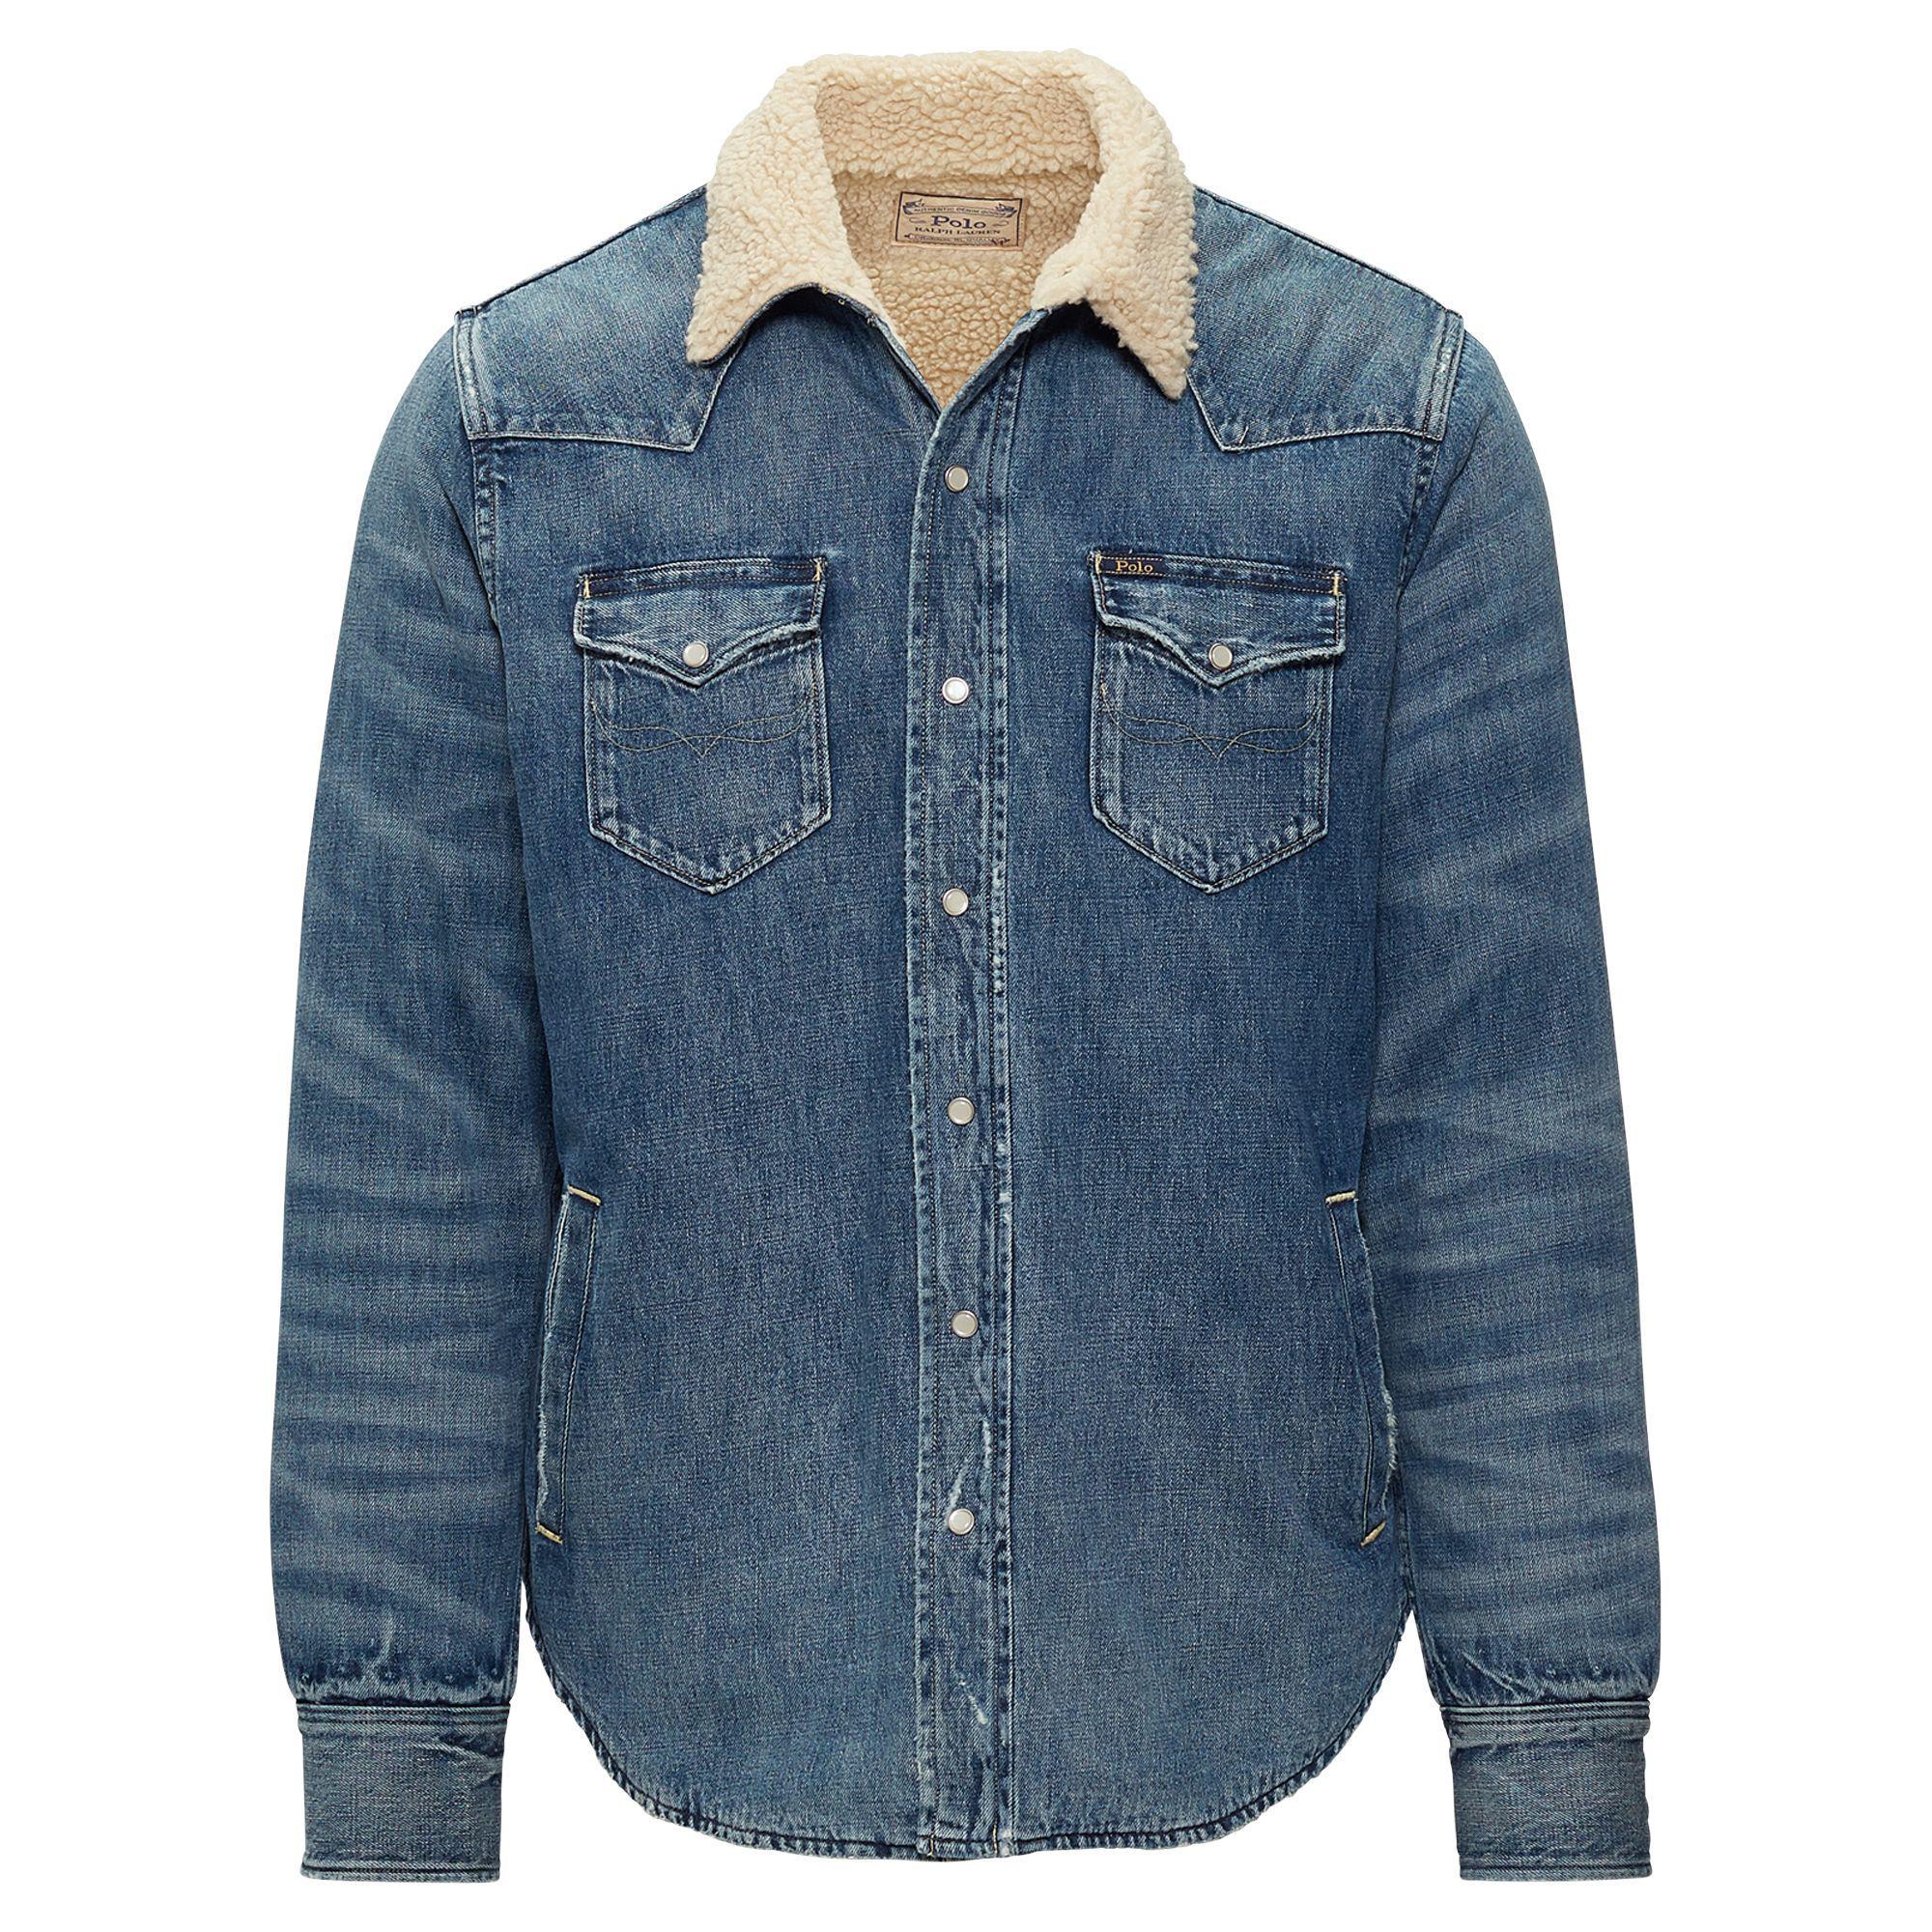 99aab9debca Polo Ralph Lauren Fleece-lined Western Overshirt in Blue for Men - Lyst